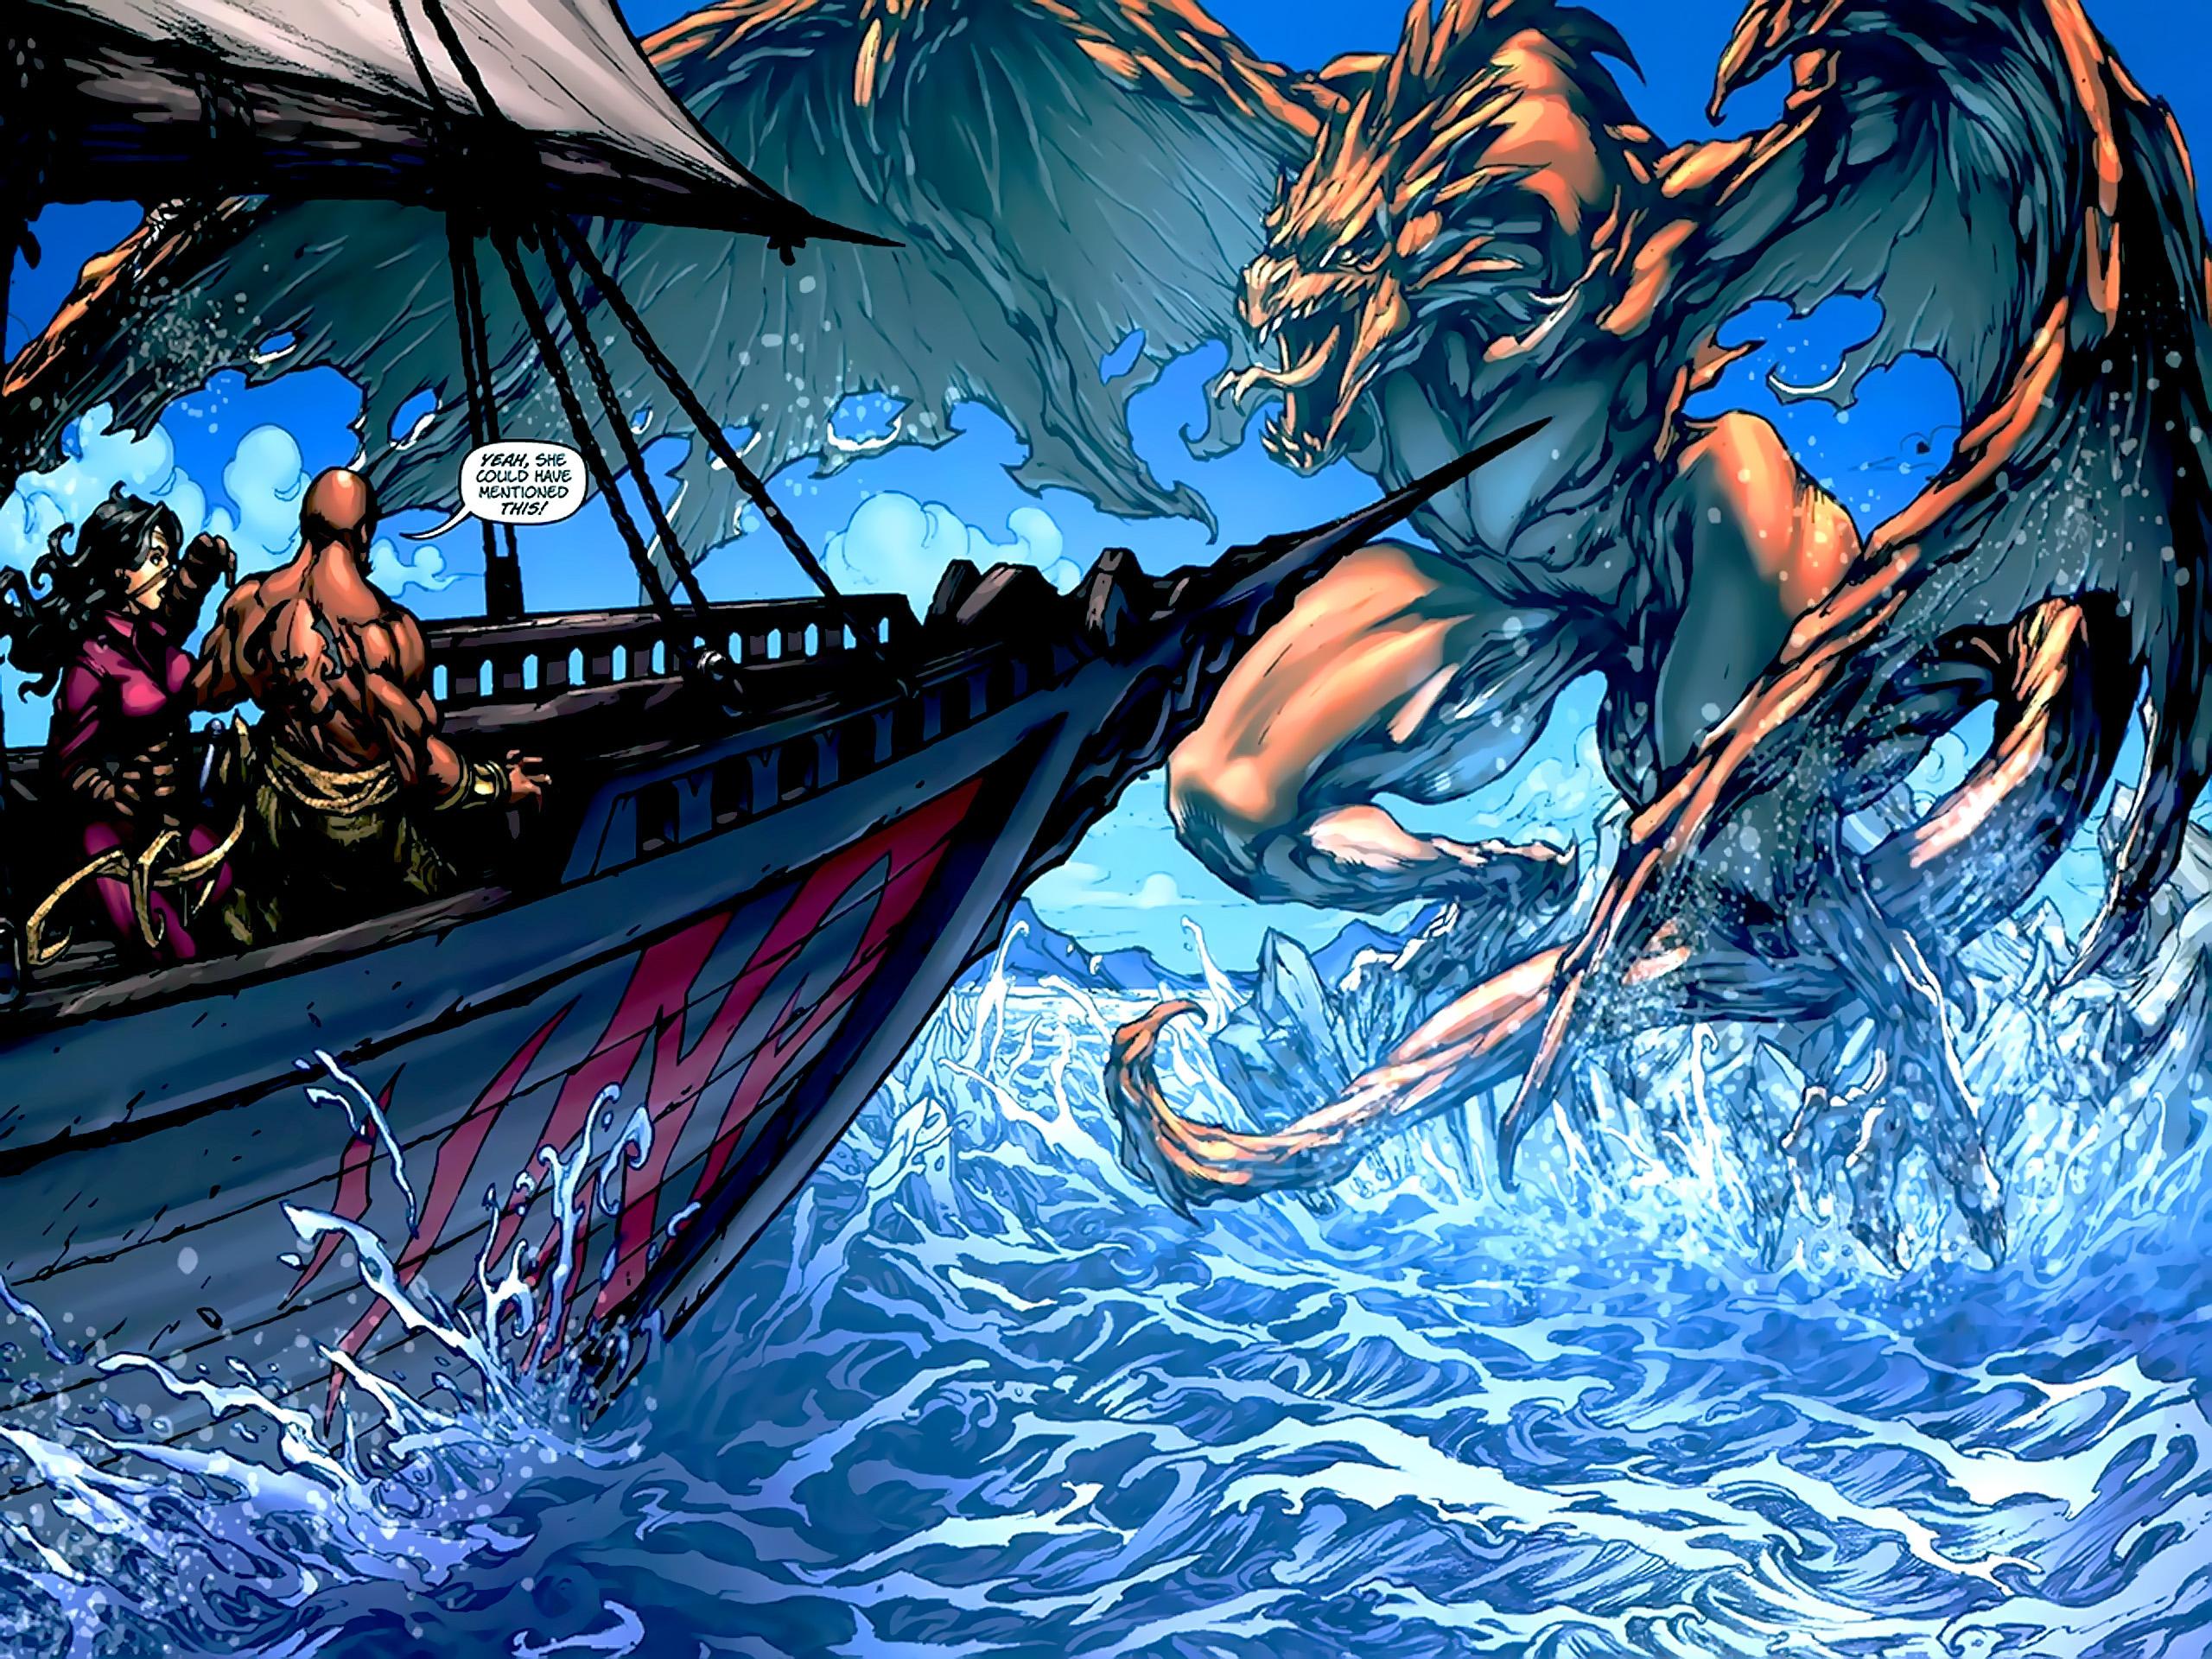 Read online 1001 Arabian Nights: The Adventures of Sinbad comic -  Issue #2 - 21